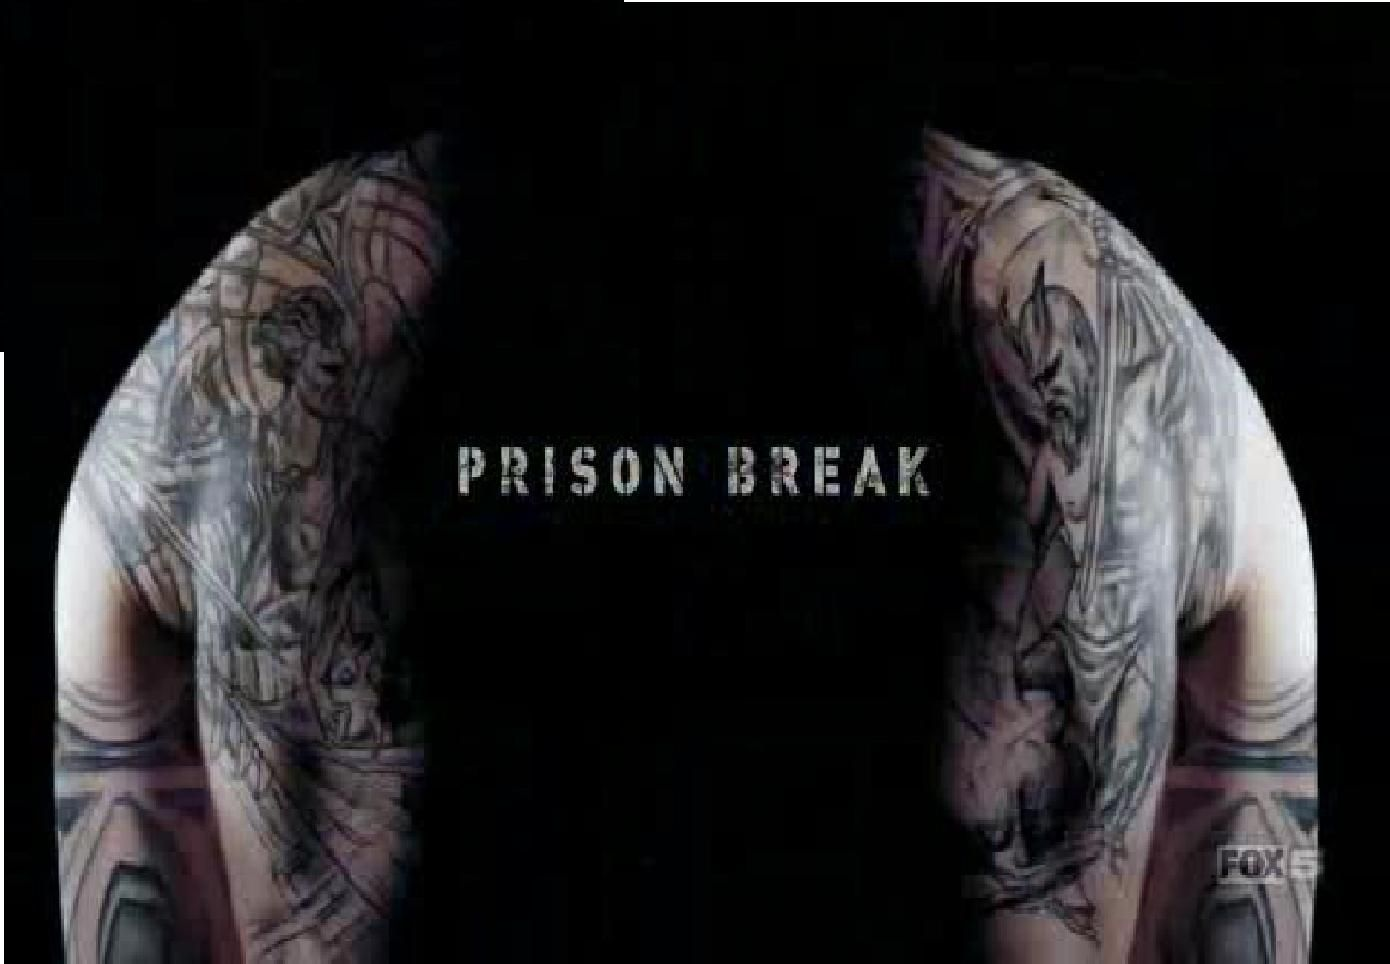 Prison break | Prison Break